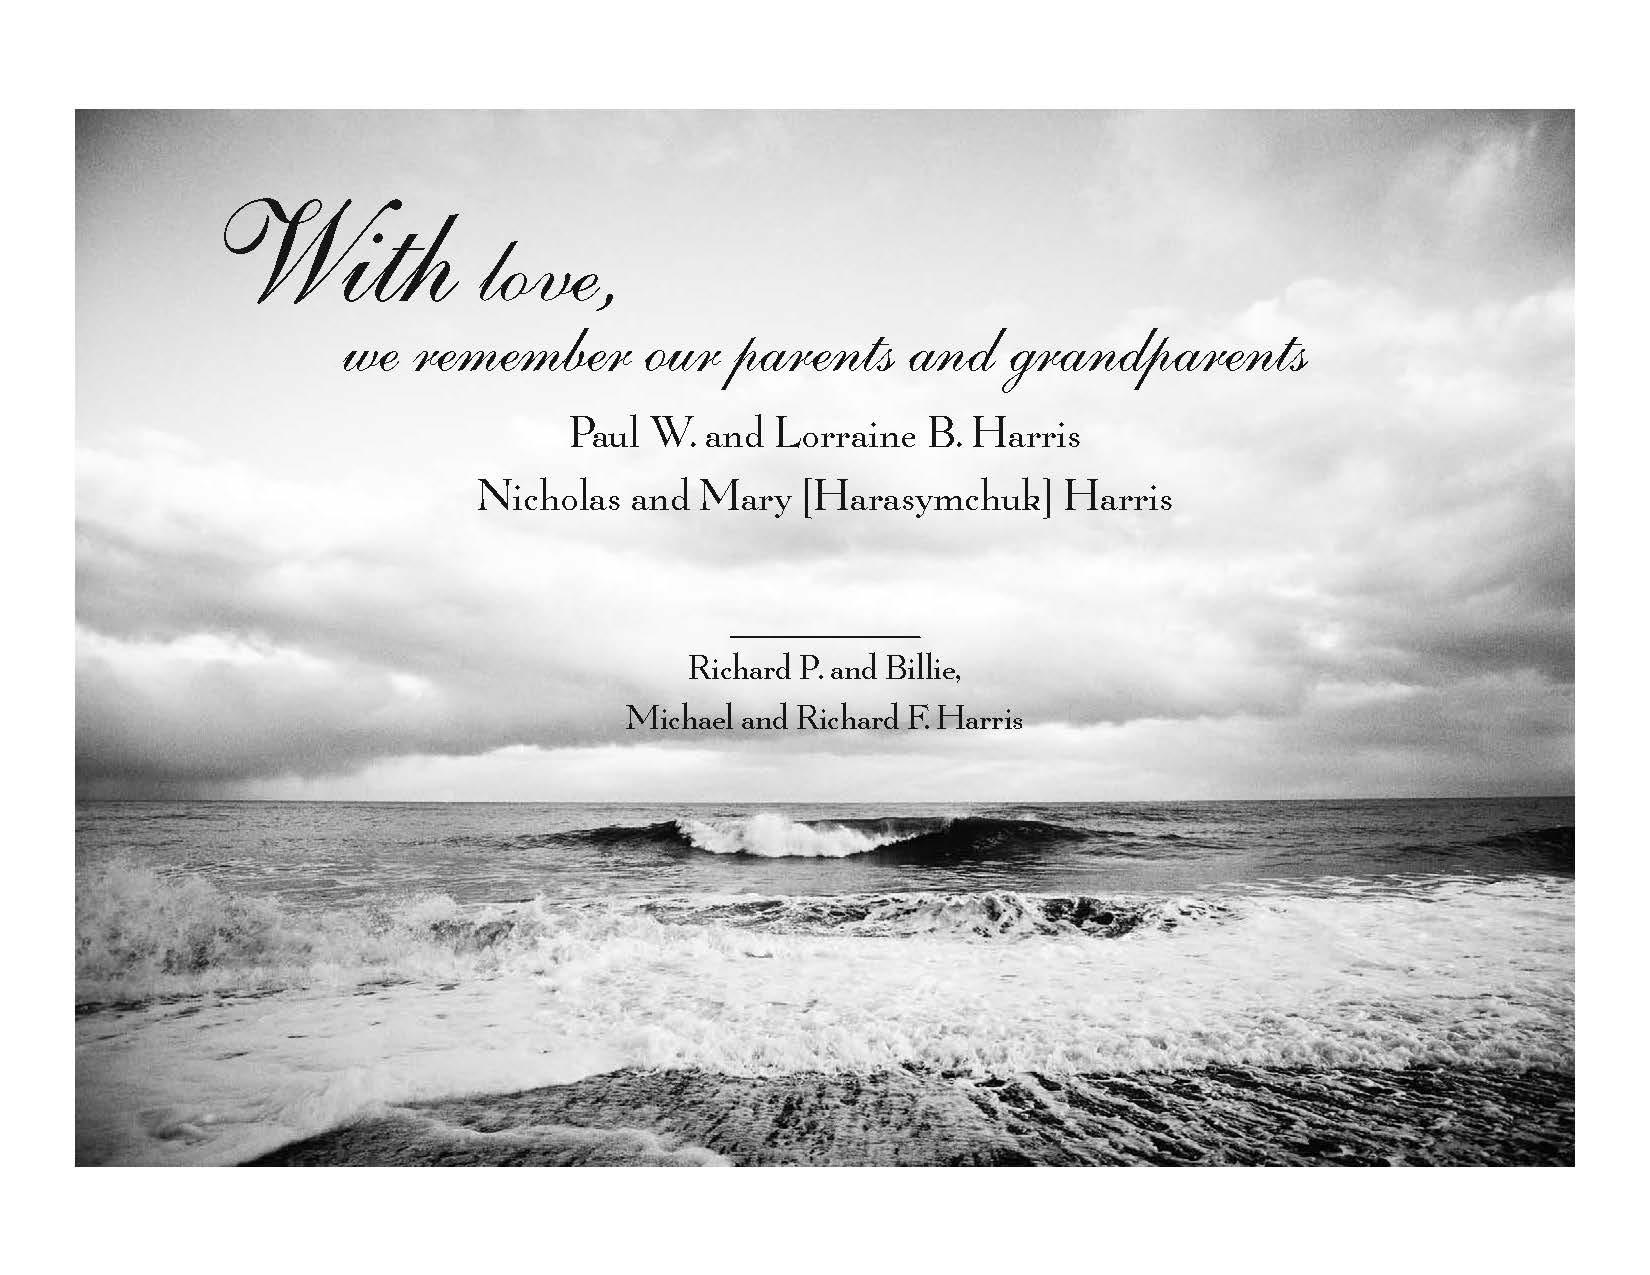 Tribute ad